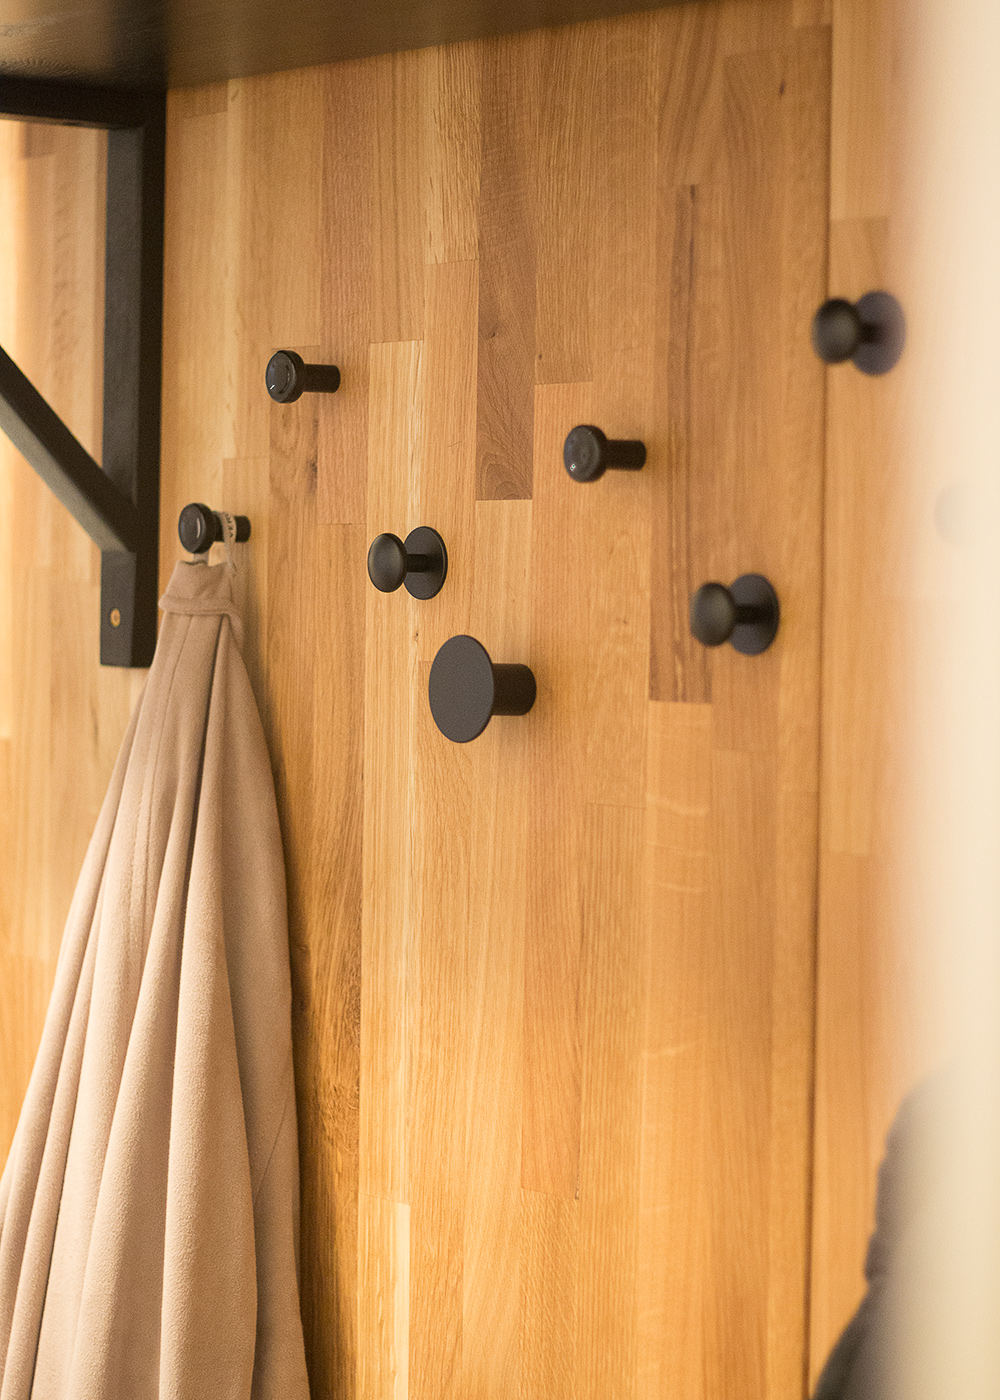 IKEA coat hanger